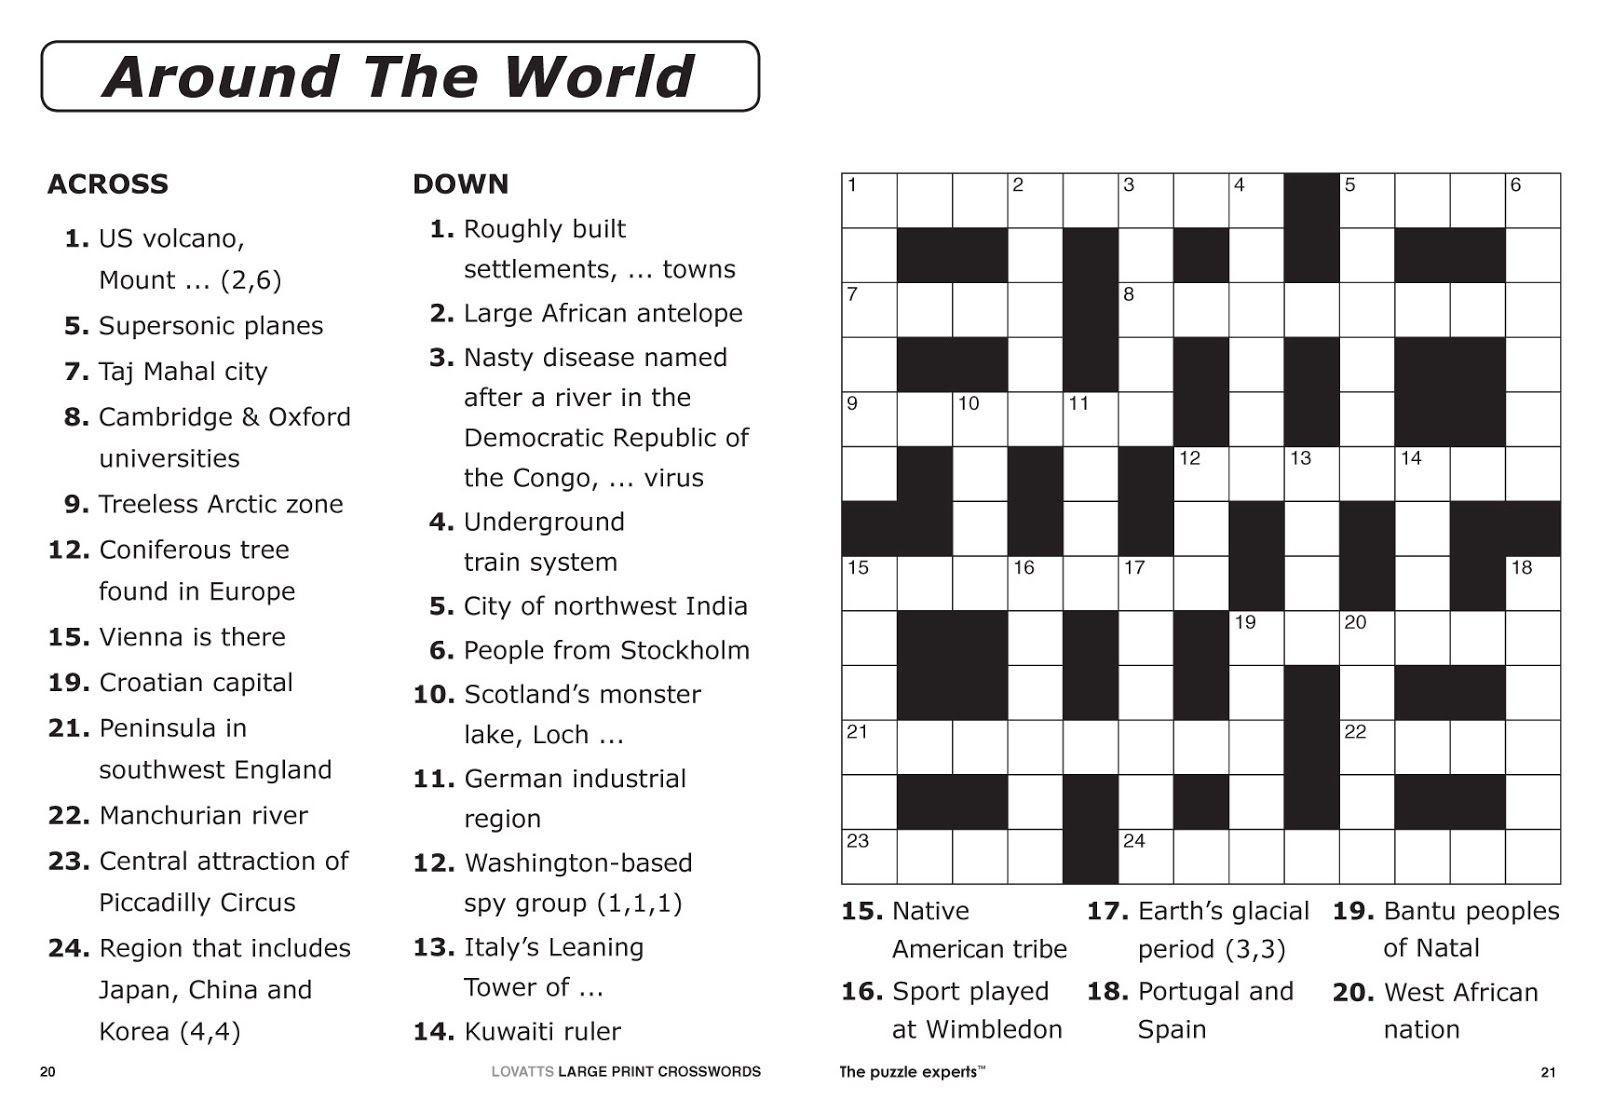 Free Printable Large Print Crossword Puzzles | M3U8 - Printable Crossword Puzzles For 8 Year Olds